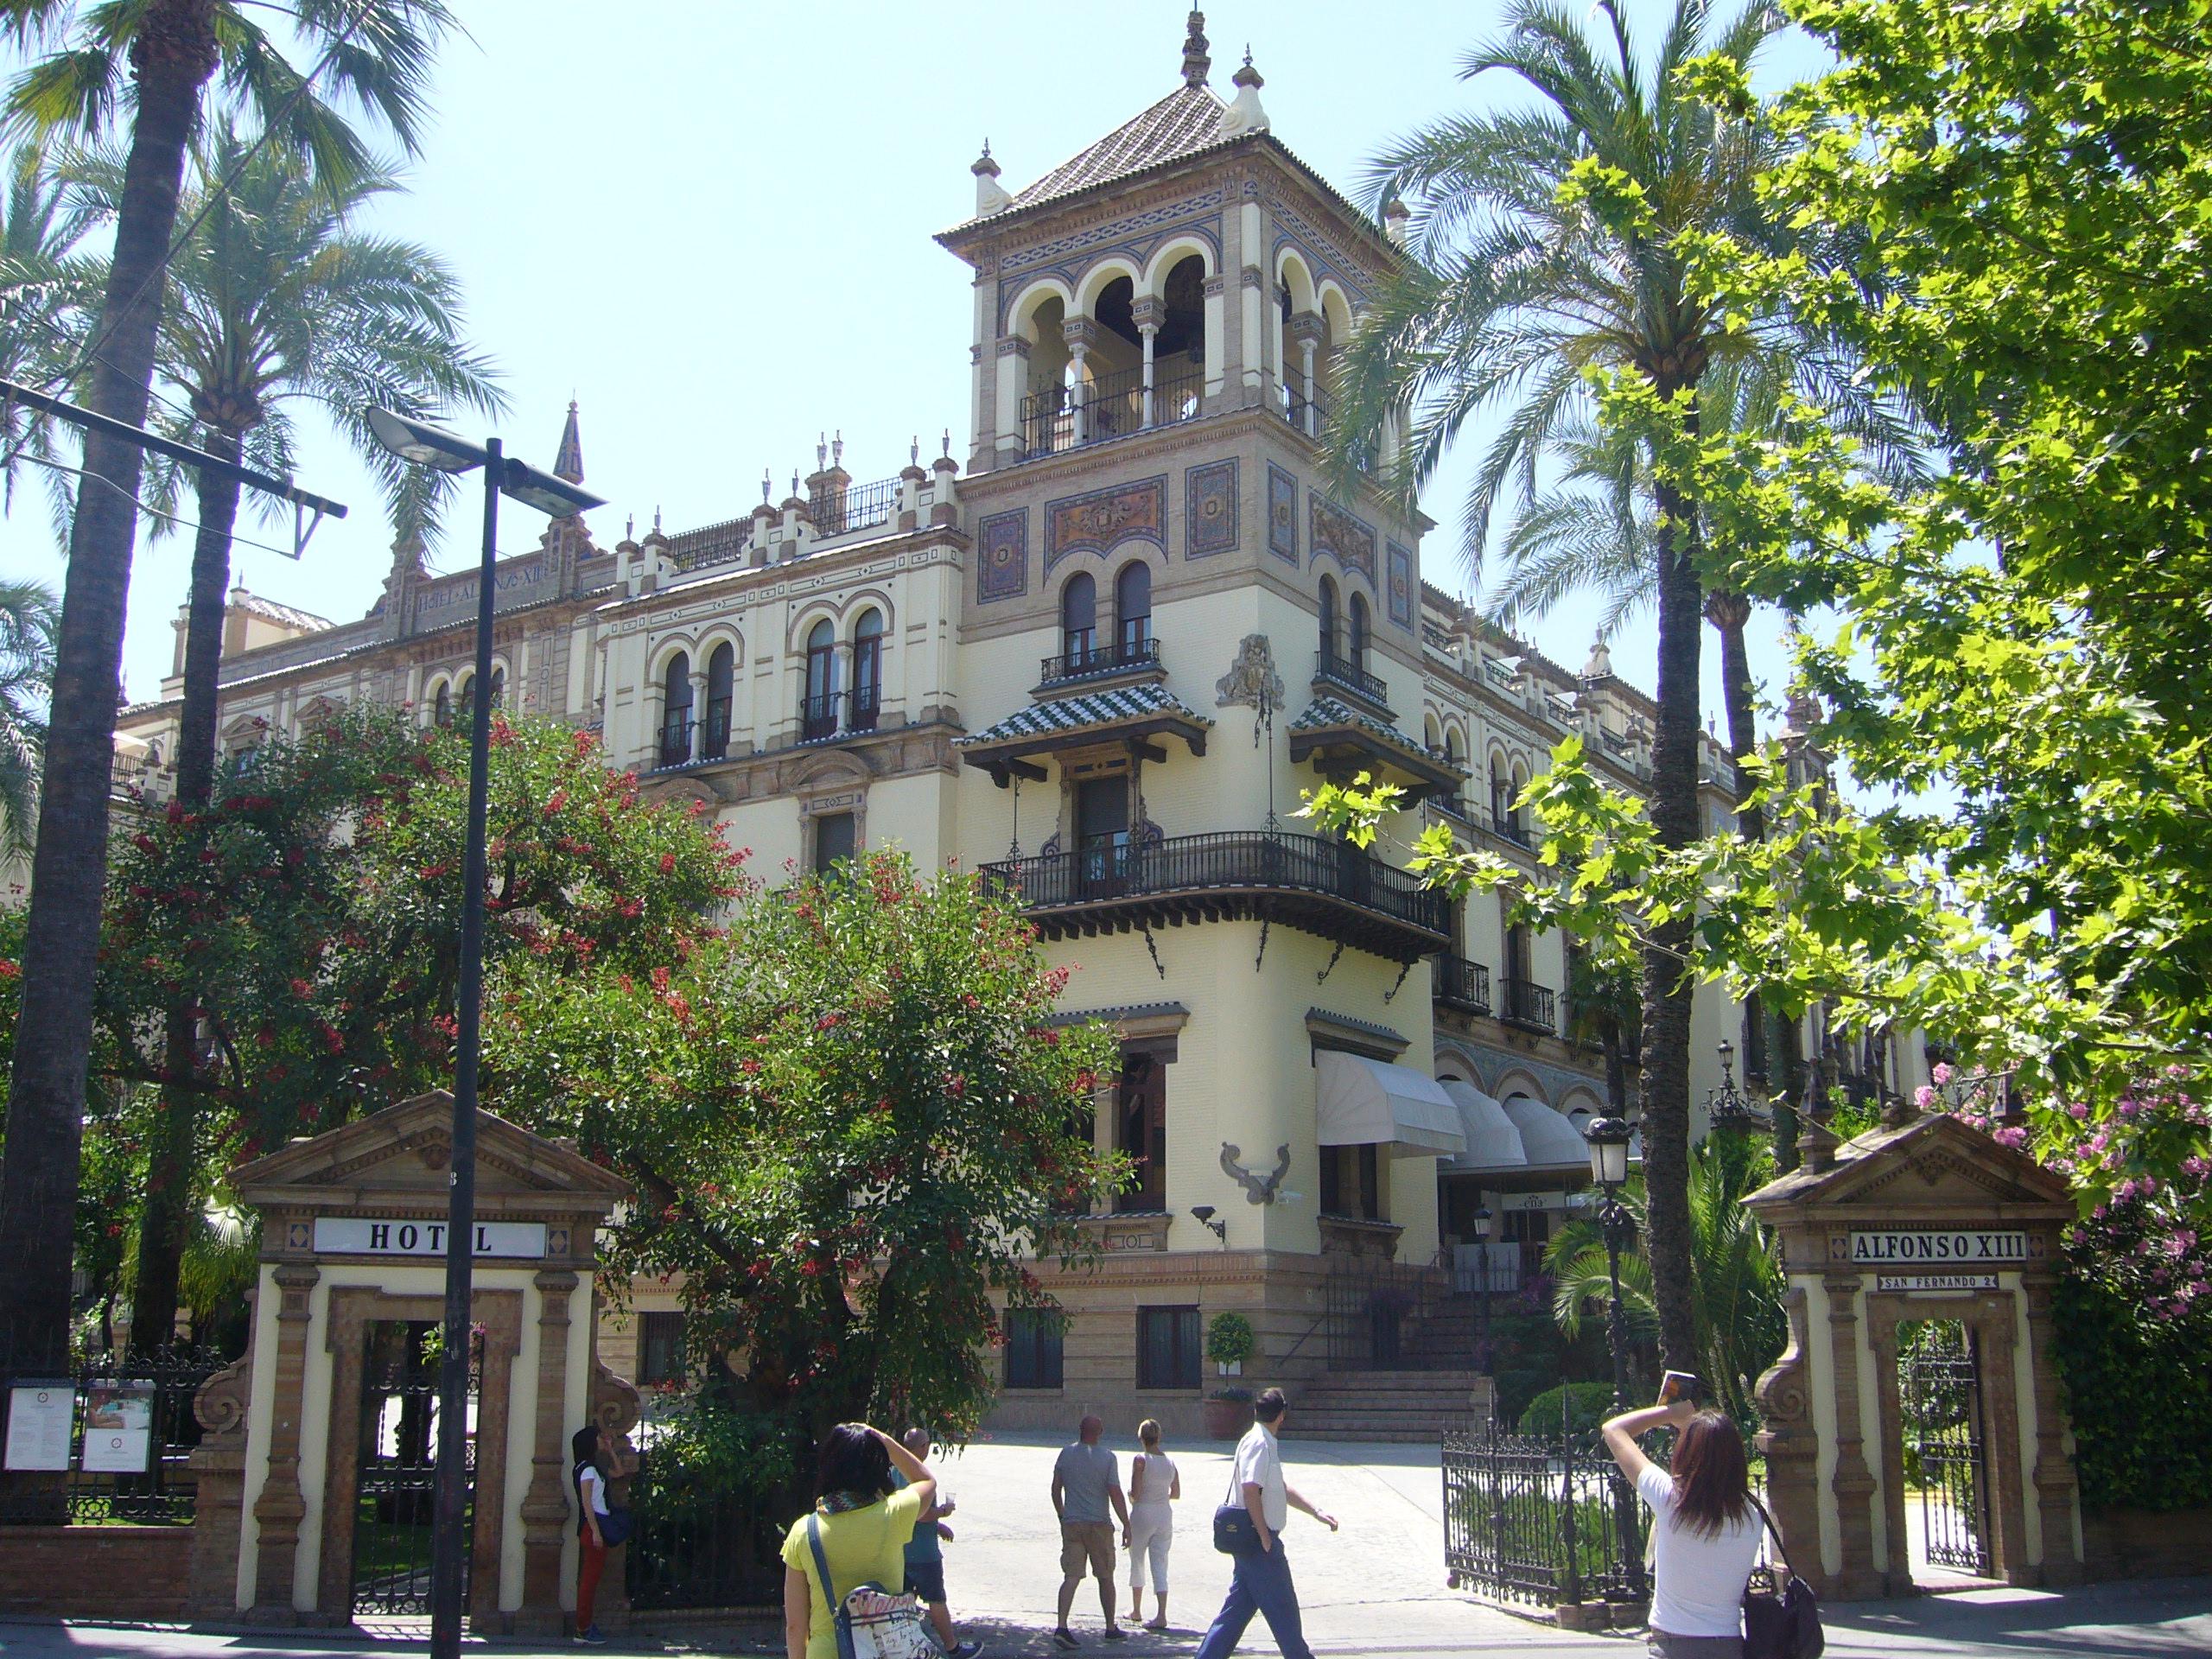 Hotel alfonso xii sevilla organiza eventos el portal for Hotel calle sevilla madrid